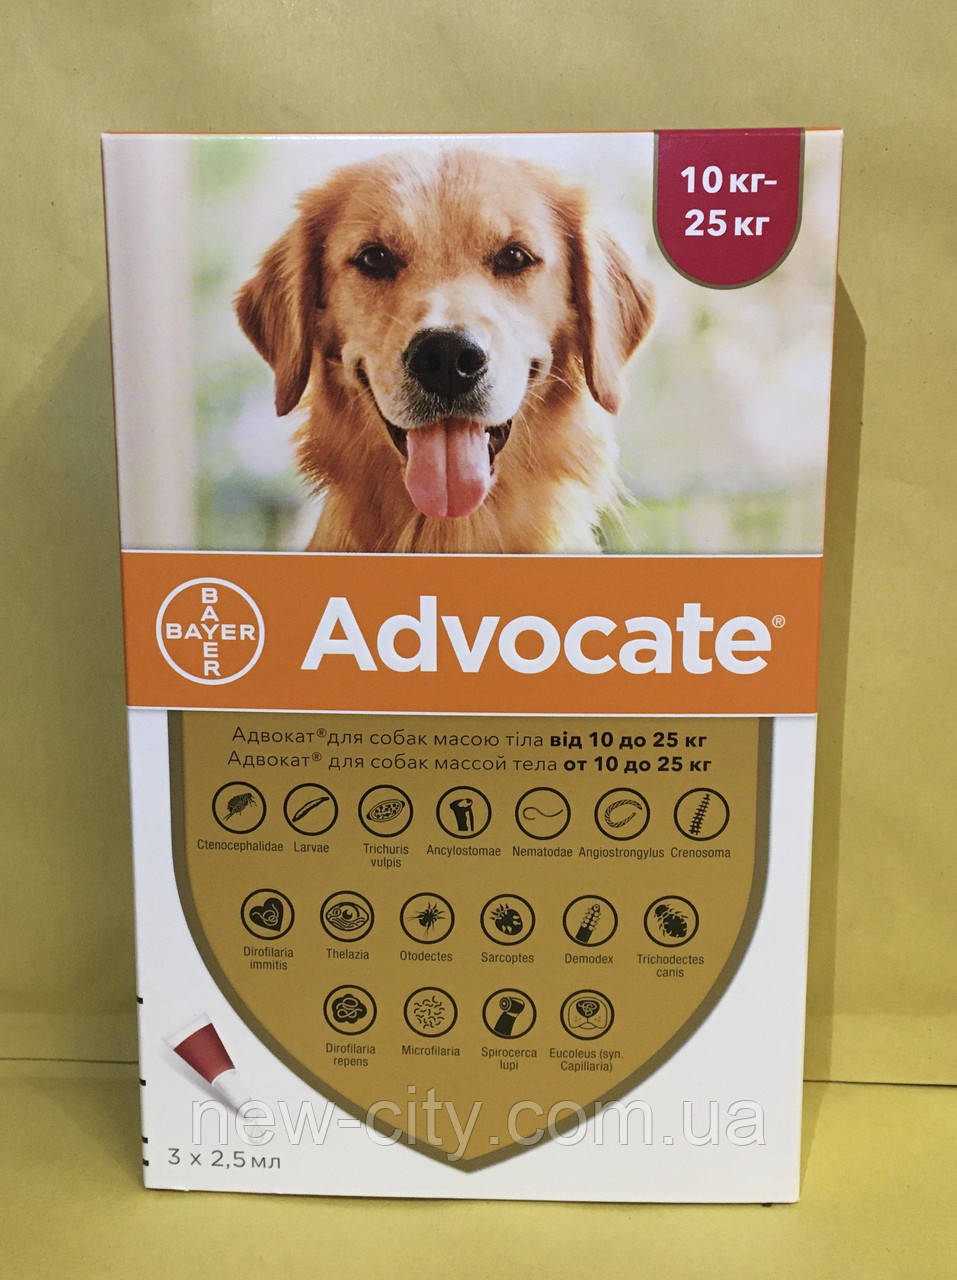 Advocate (Адвокат) капли для собак весом 10-25 кг за пипетку